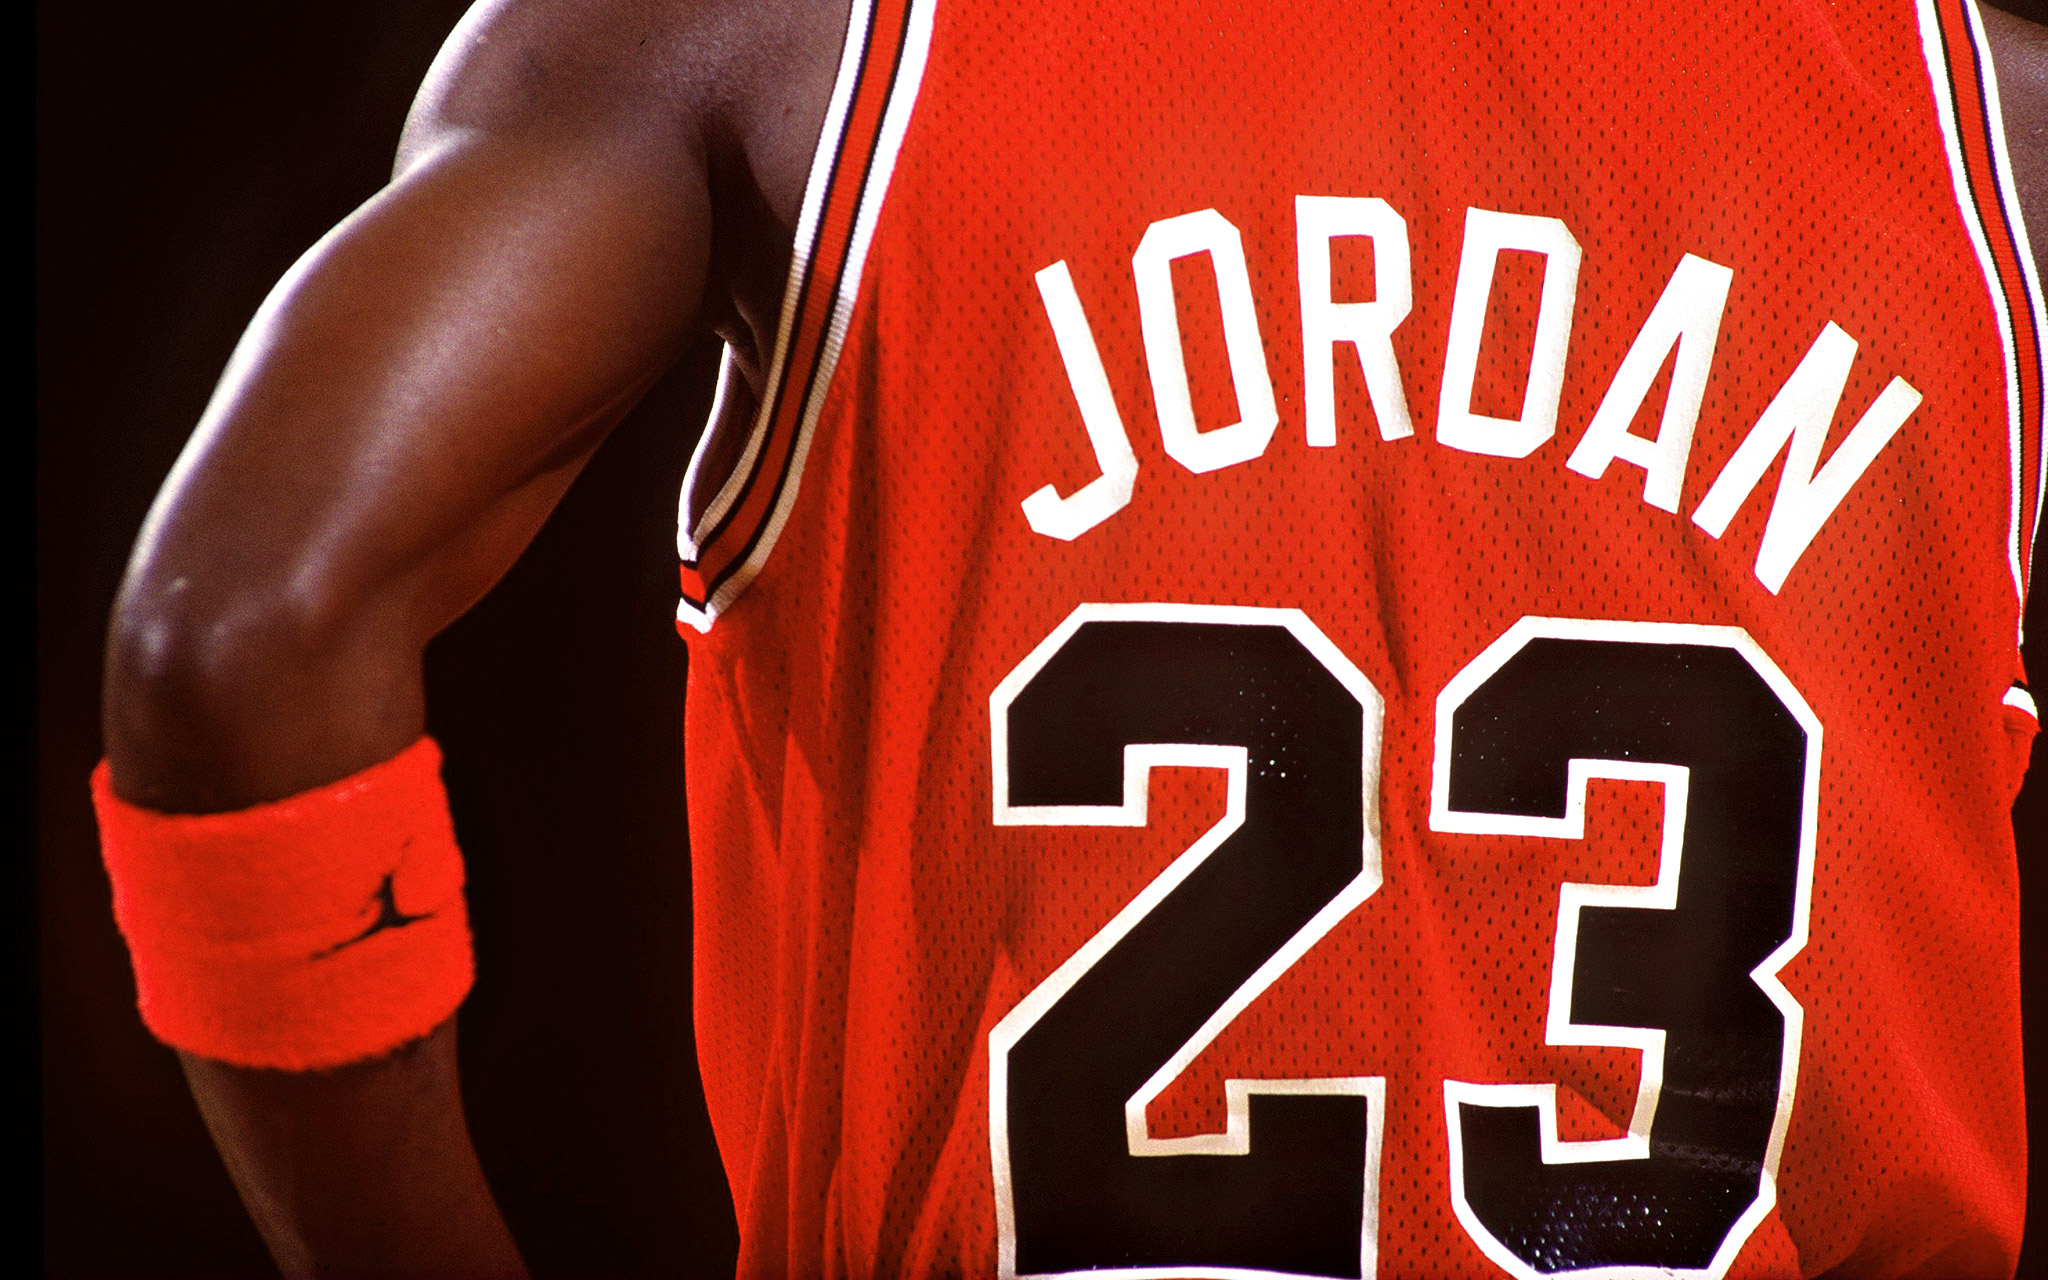 NBA Jersey Stories – La leggenda di Michael Jordan